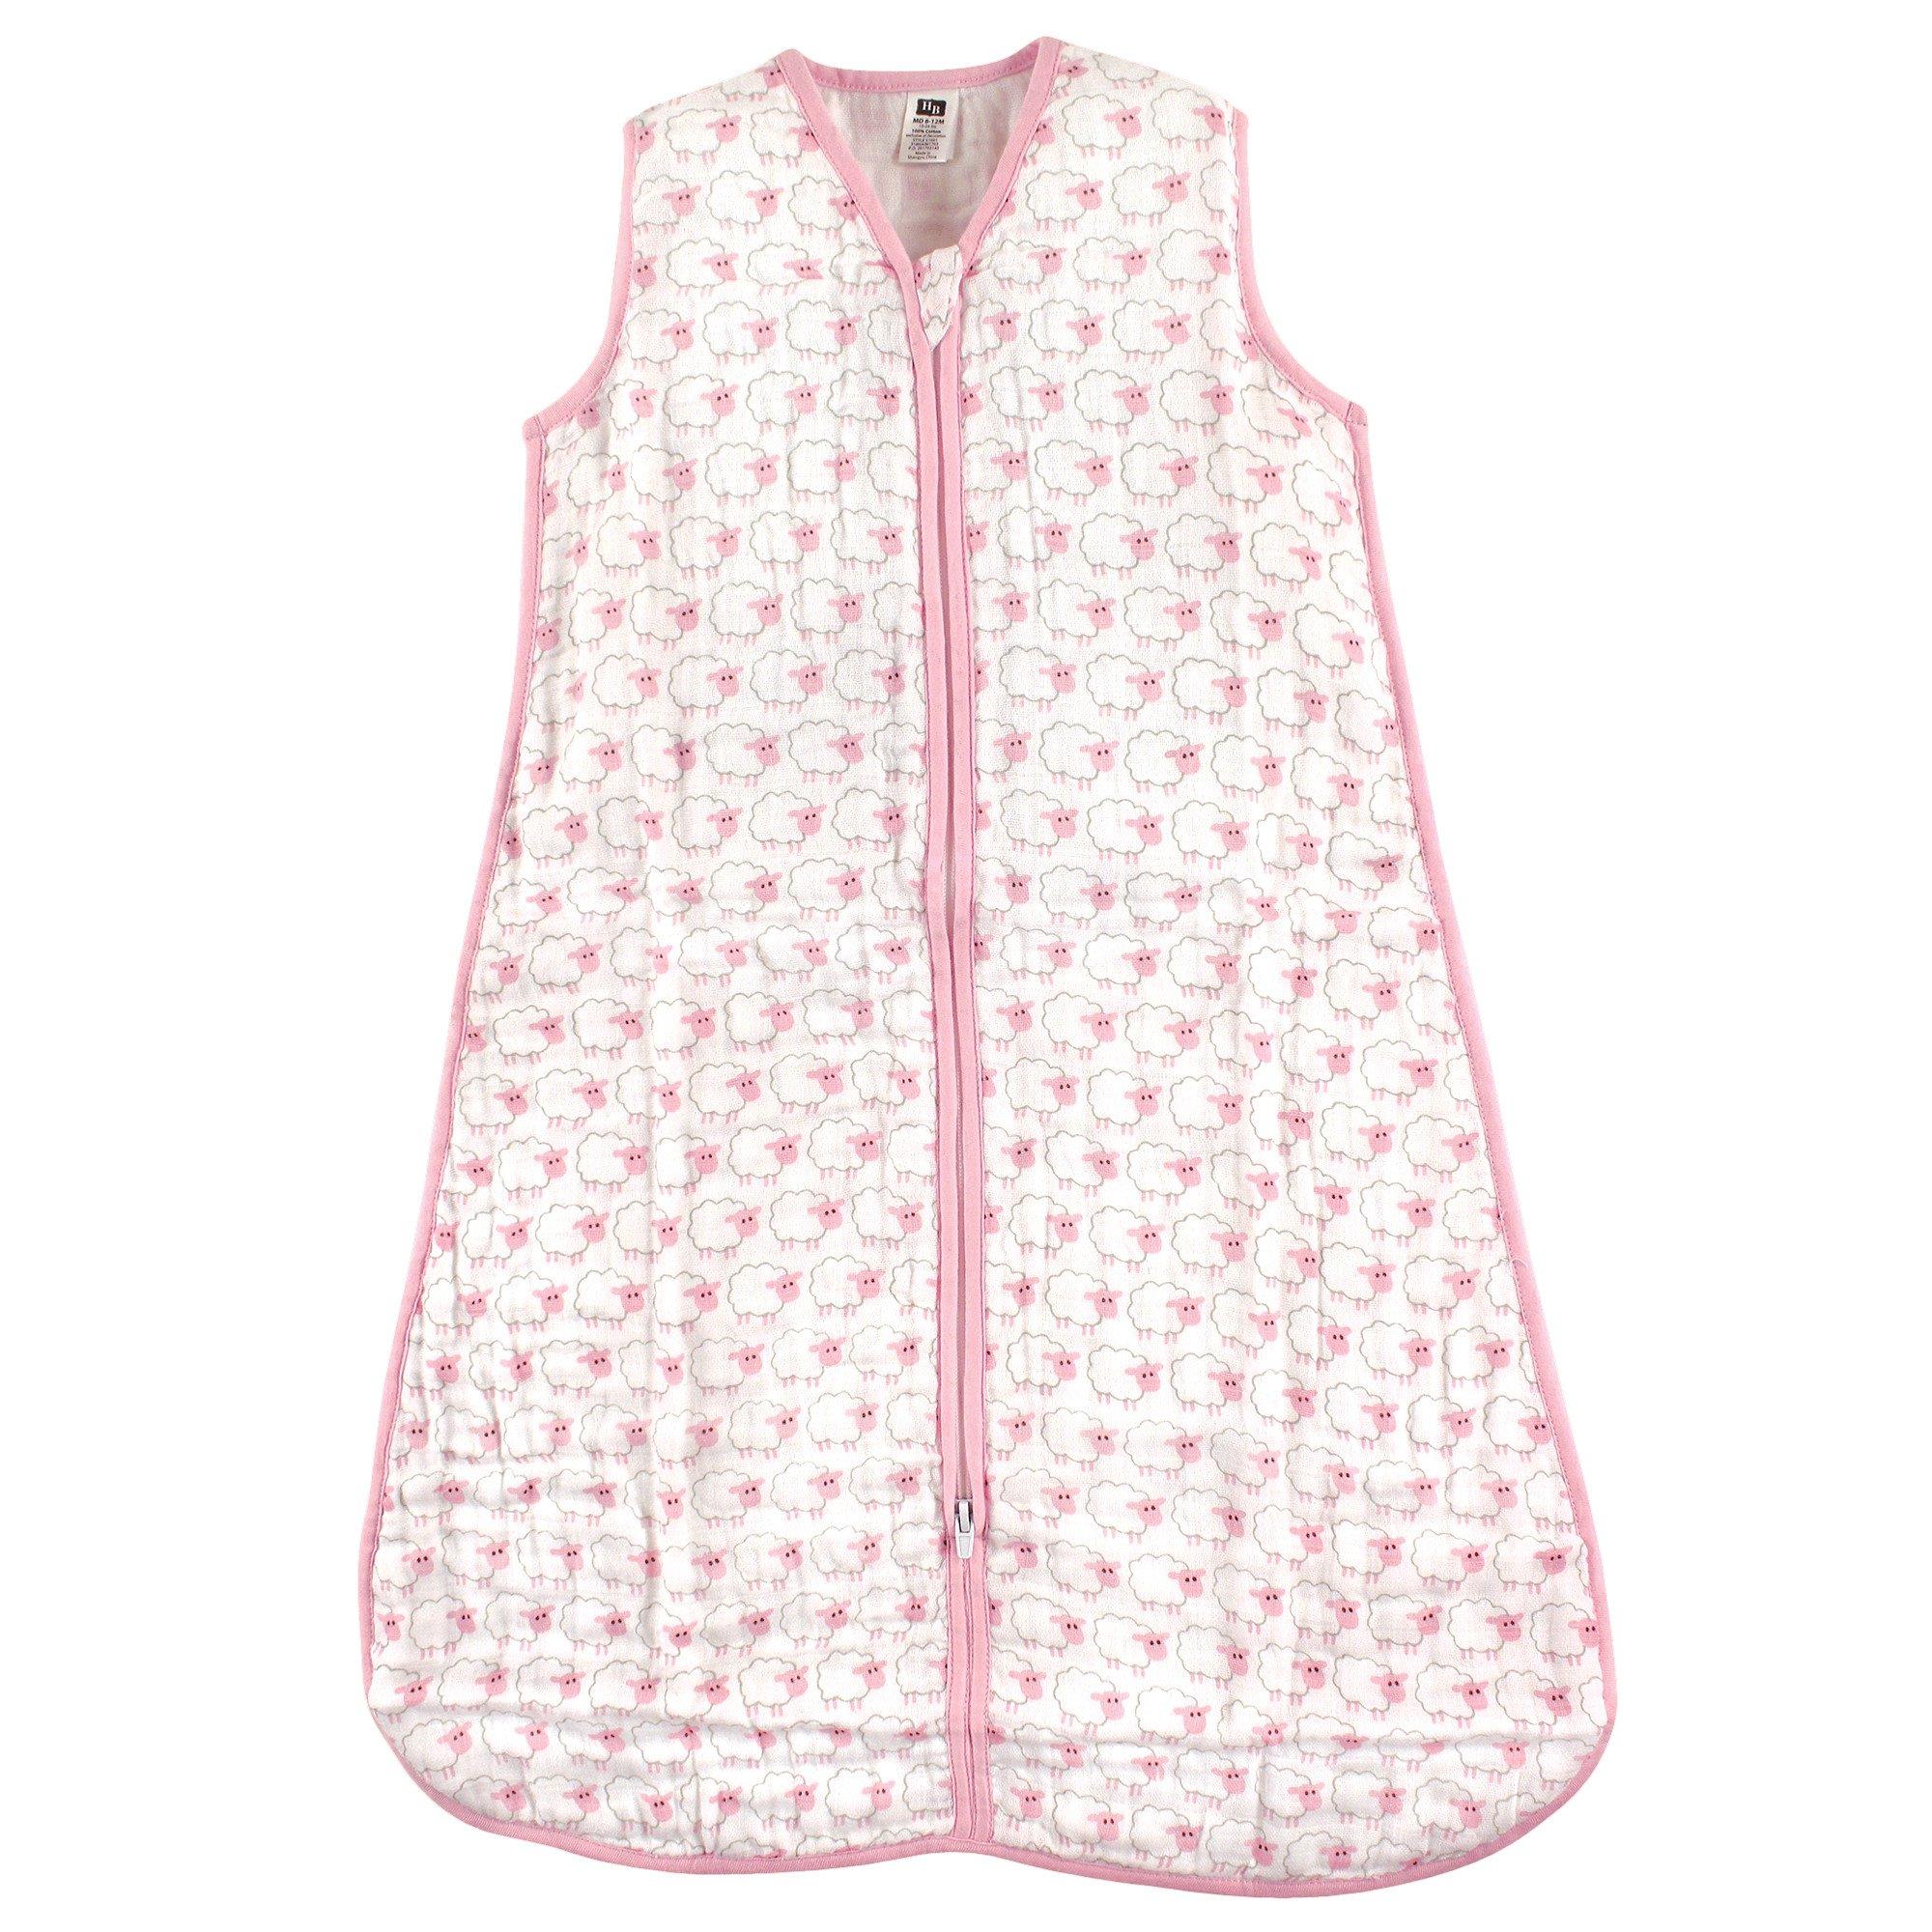 Hudson Baby Unisex Baby Safe Sleep Wearable Muslin Sleeping Bag, Pink Sheep 1-Pack, 6-12 Months by Hudson Baby